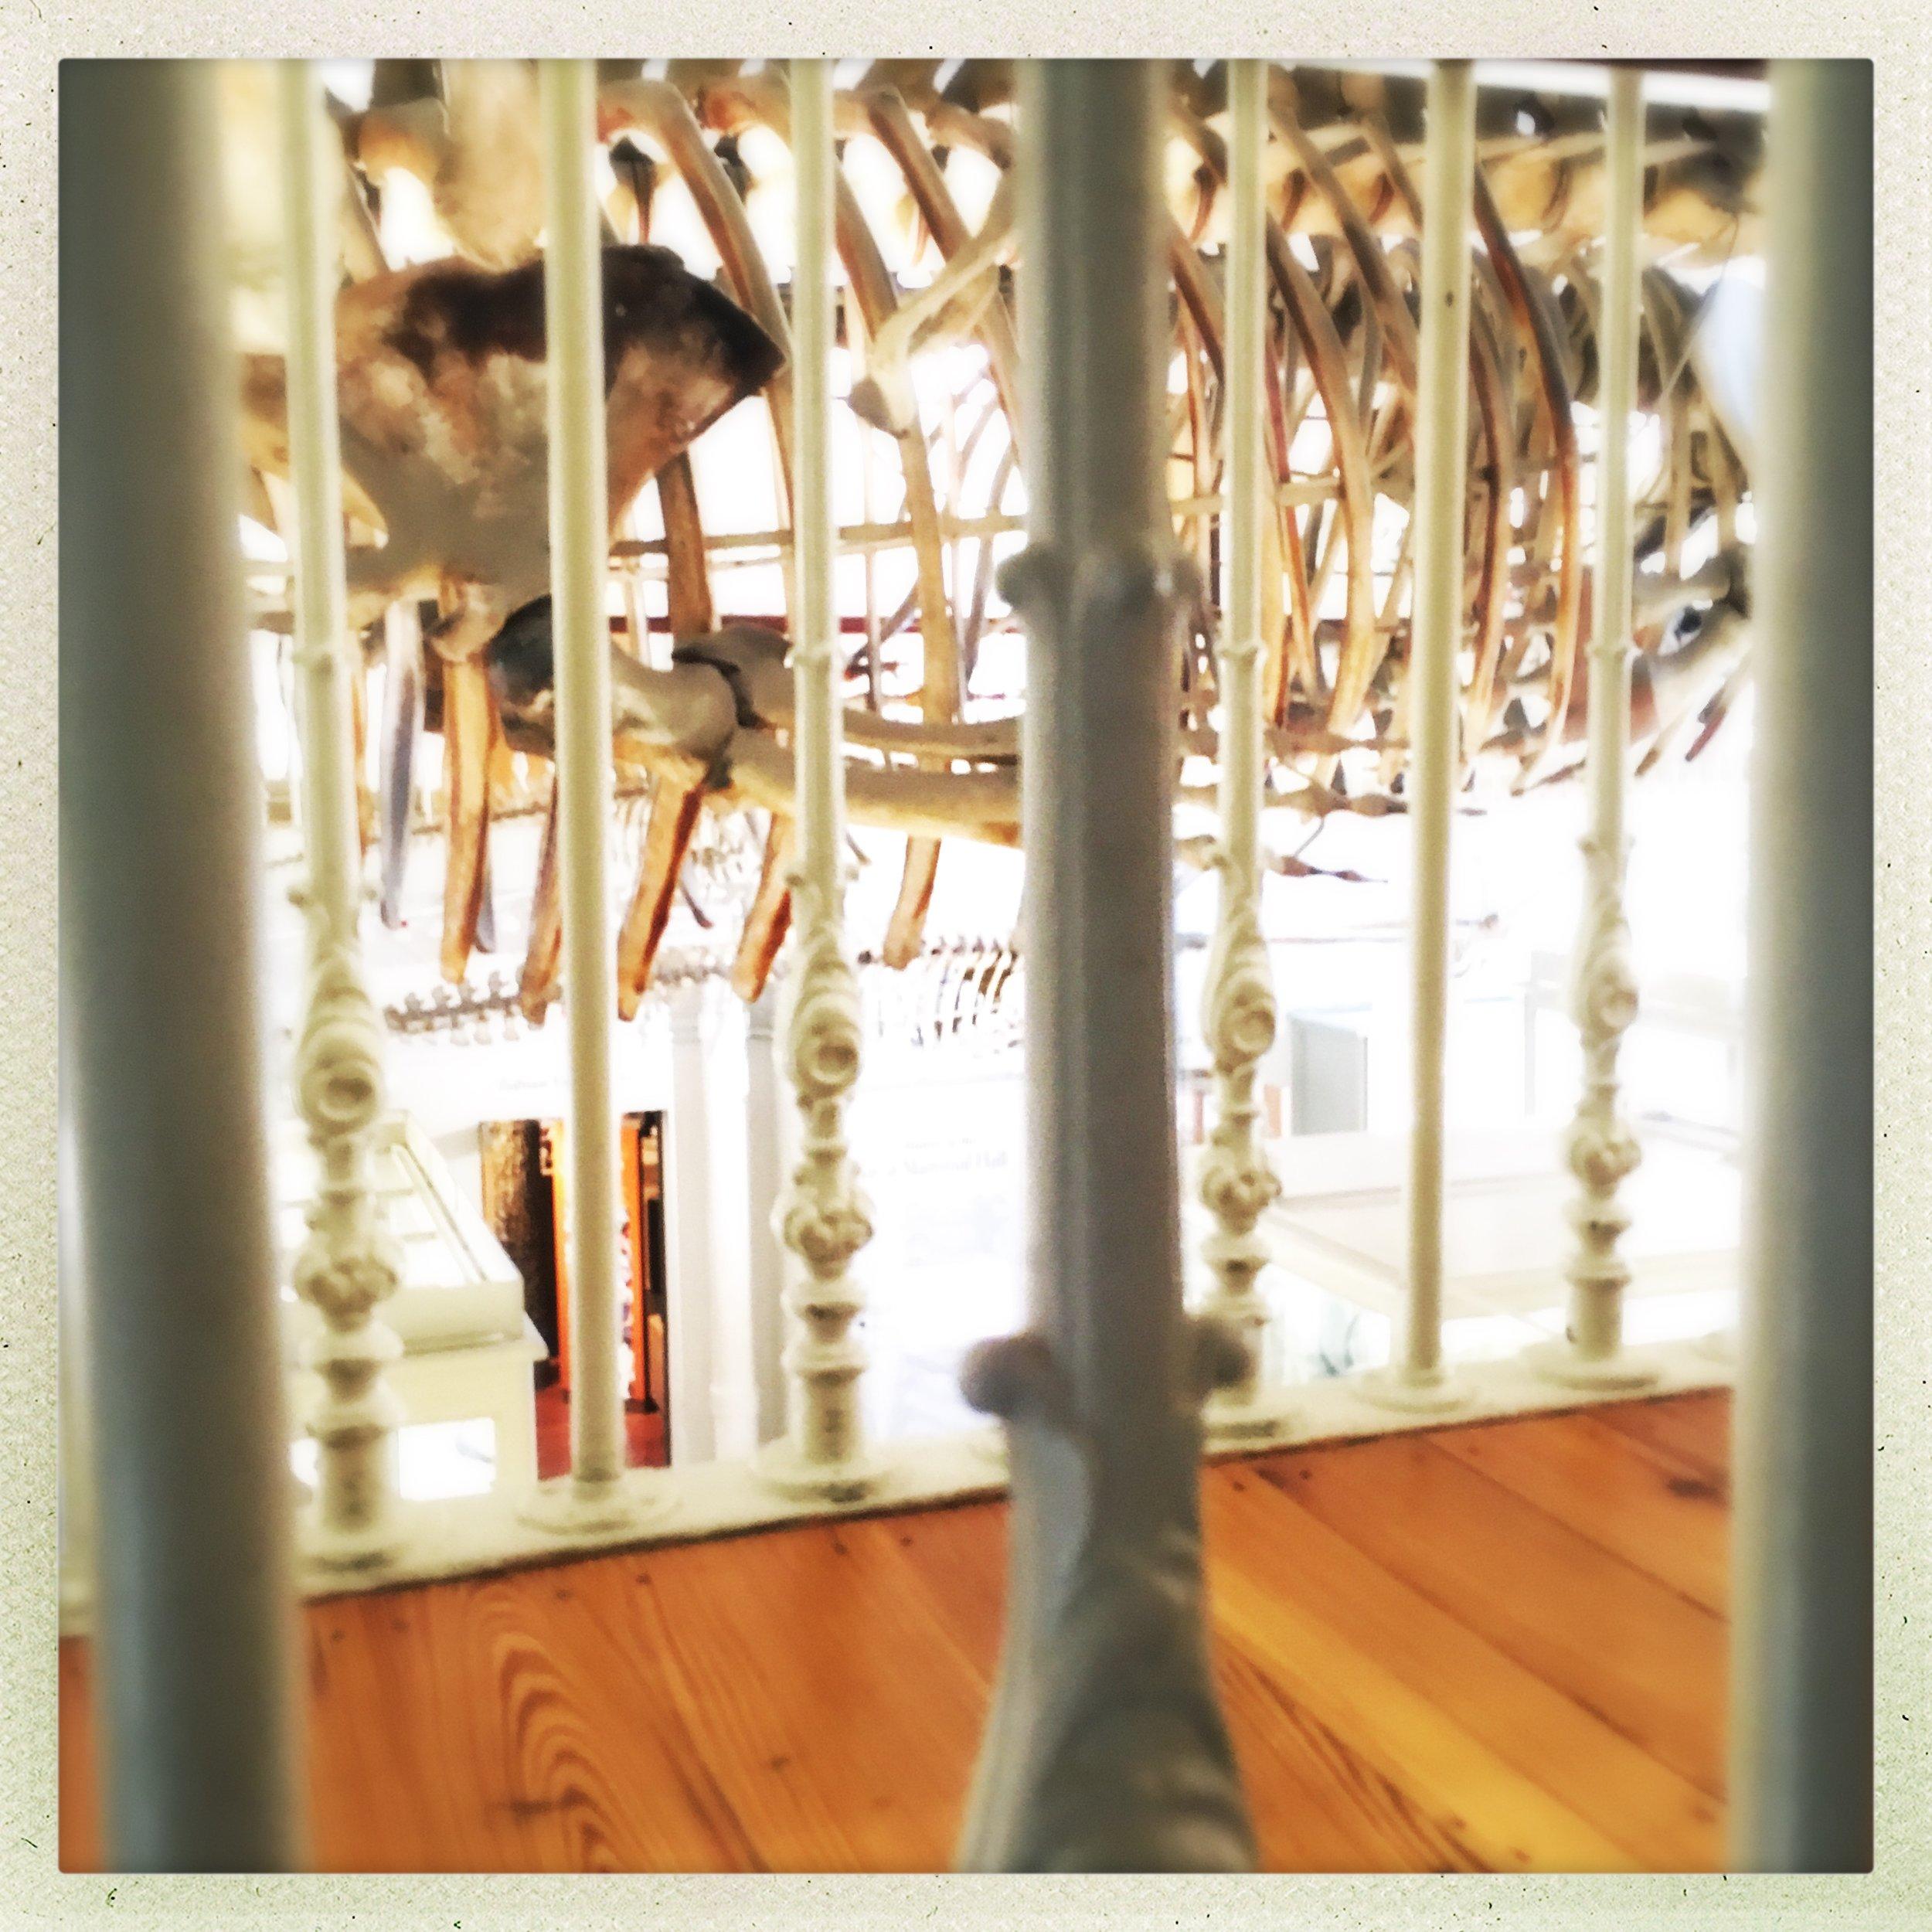 looking at whale bones through mezzanine bones